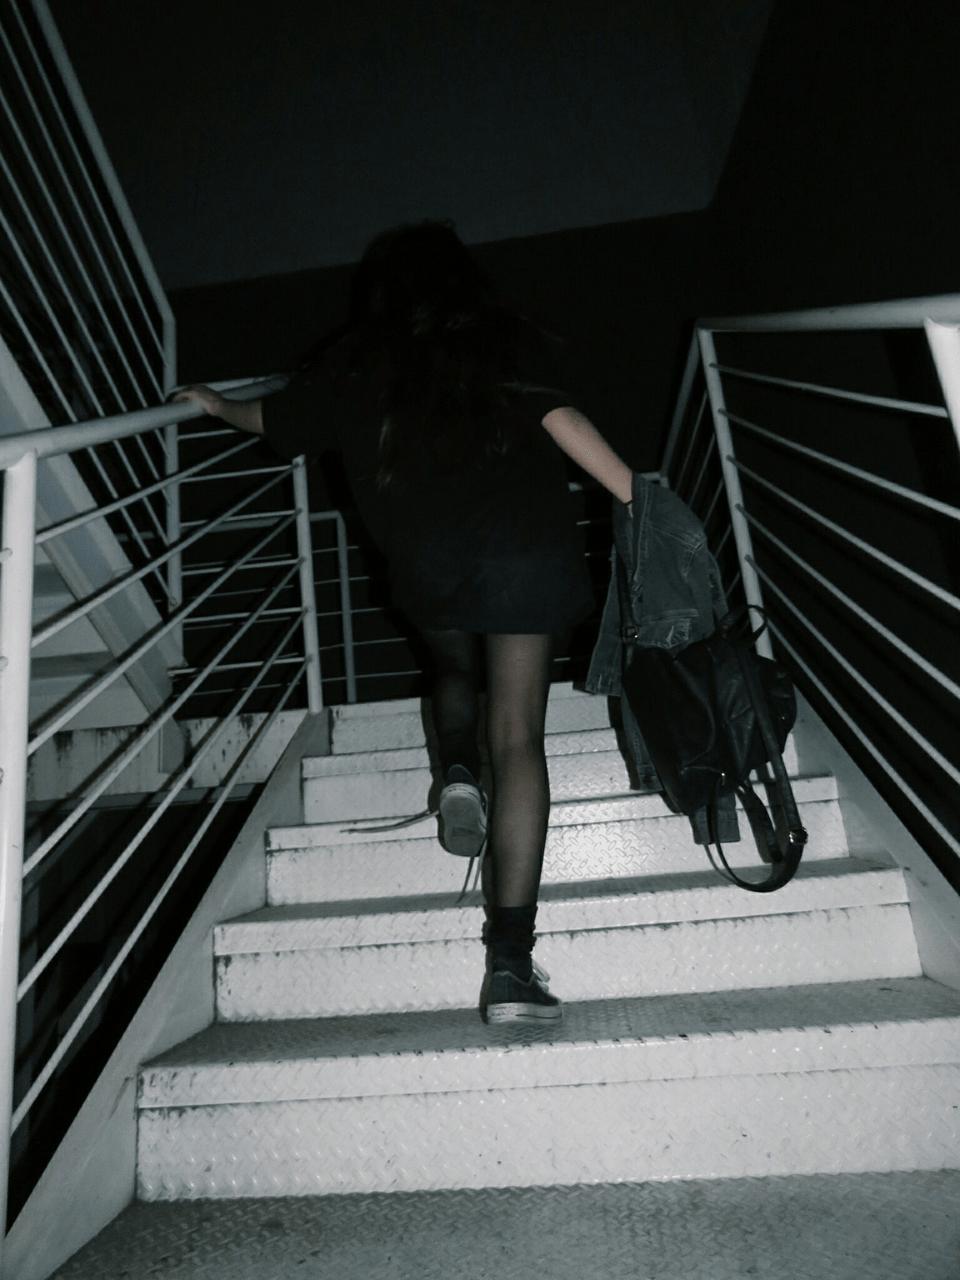 Grunge Tumblr Aesthetic : grunge, tumblr, aesthetic, Grunge, Aesthetic